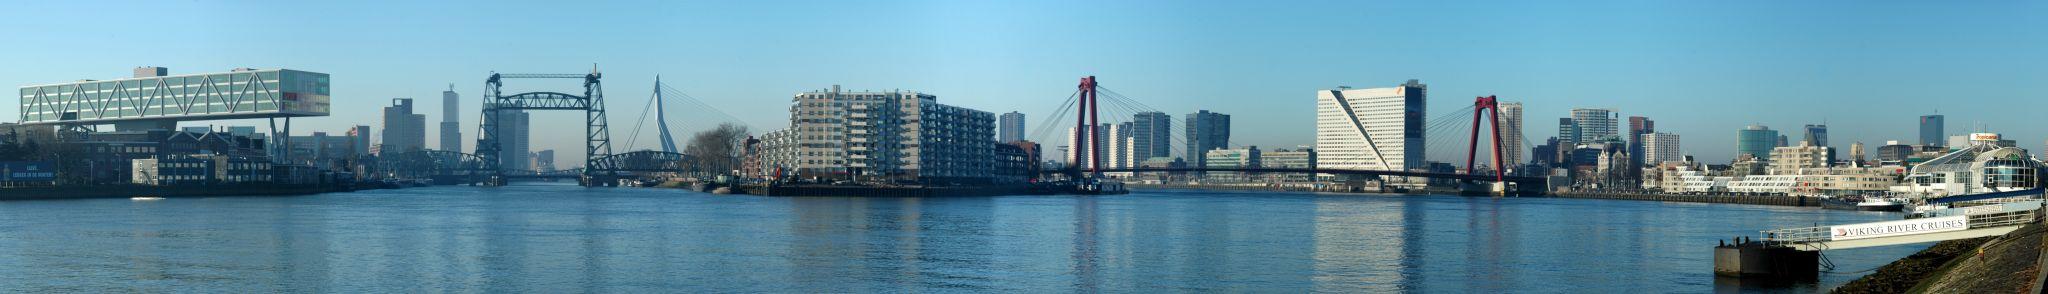 Bridges of Rotterdam, Netherlands